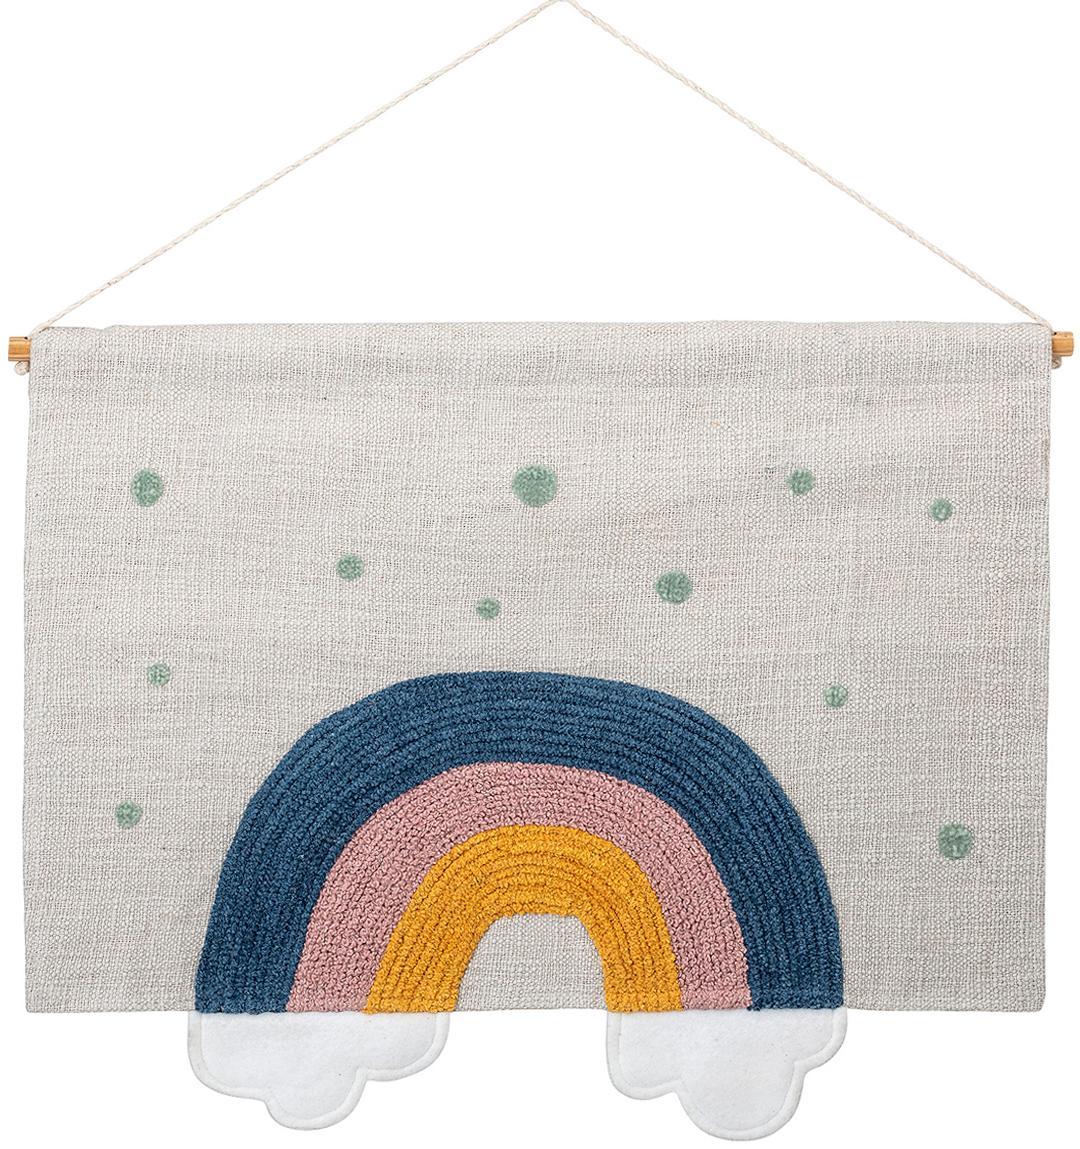 Großes Wandobjekt Rainbow, Baumwolle, Weiß, Blau, Gelb, Grün, 60 x 49 cm